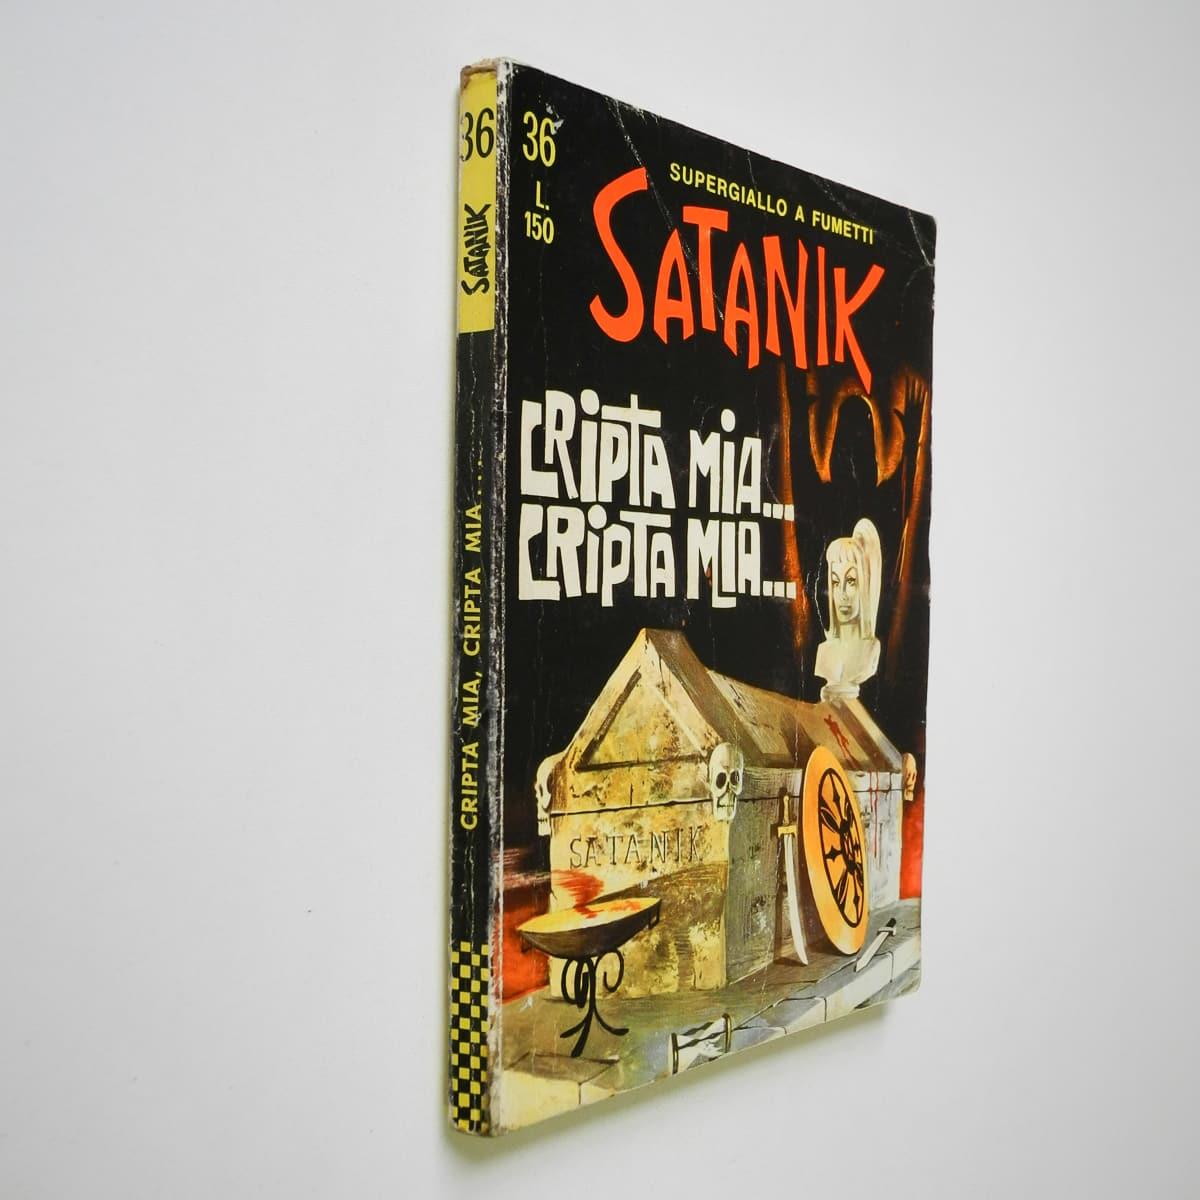 Satanik n. 36 Magnus originale